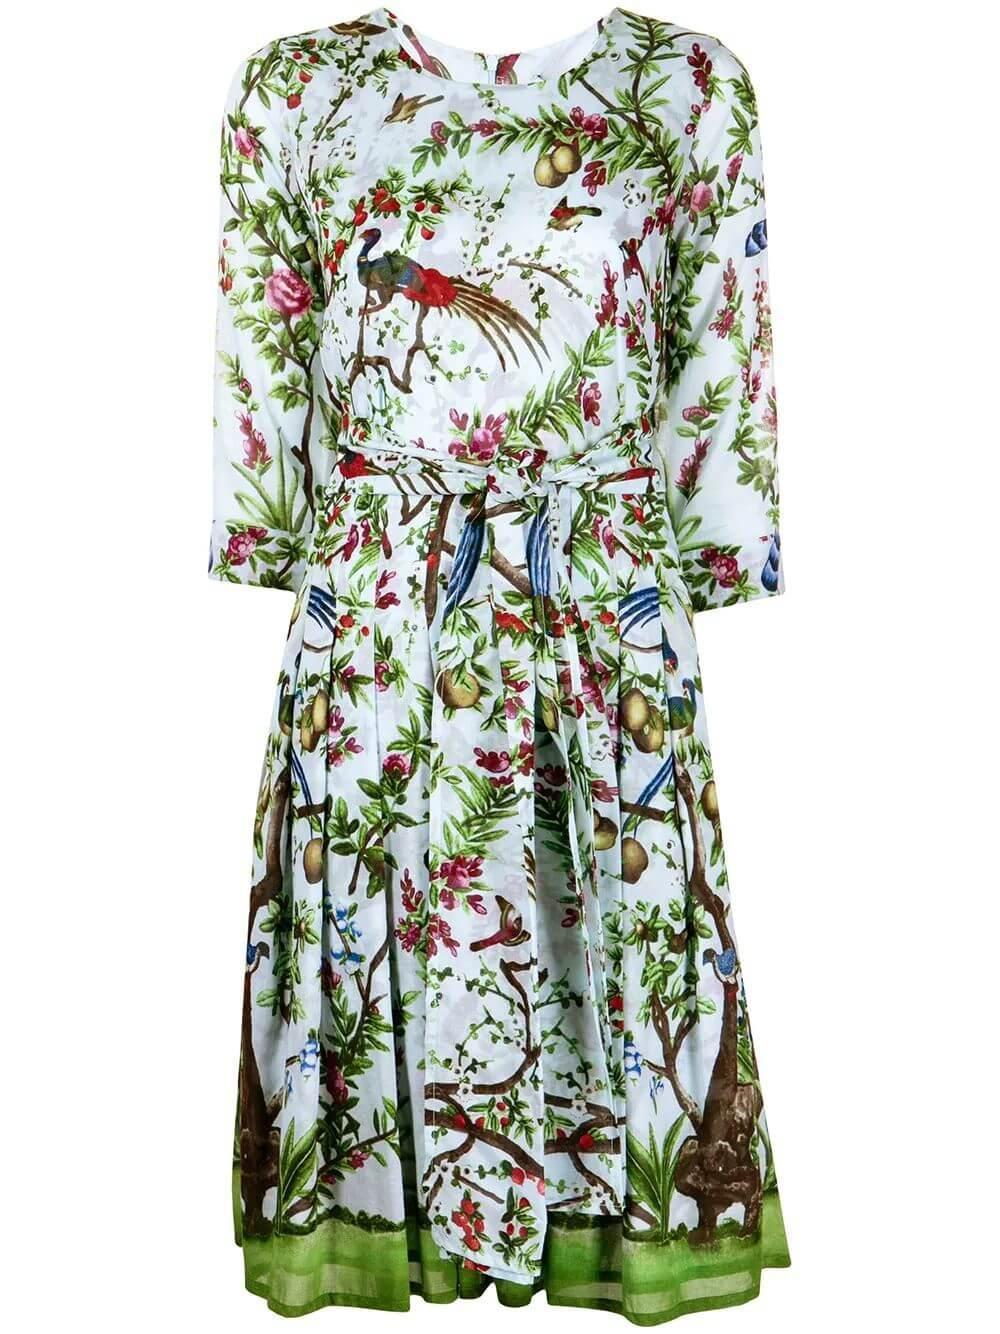 Florance 4 Printed Dress